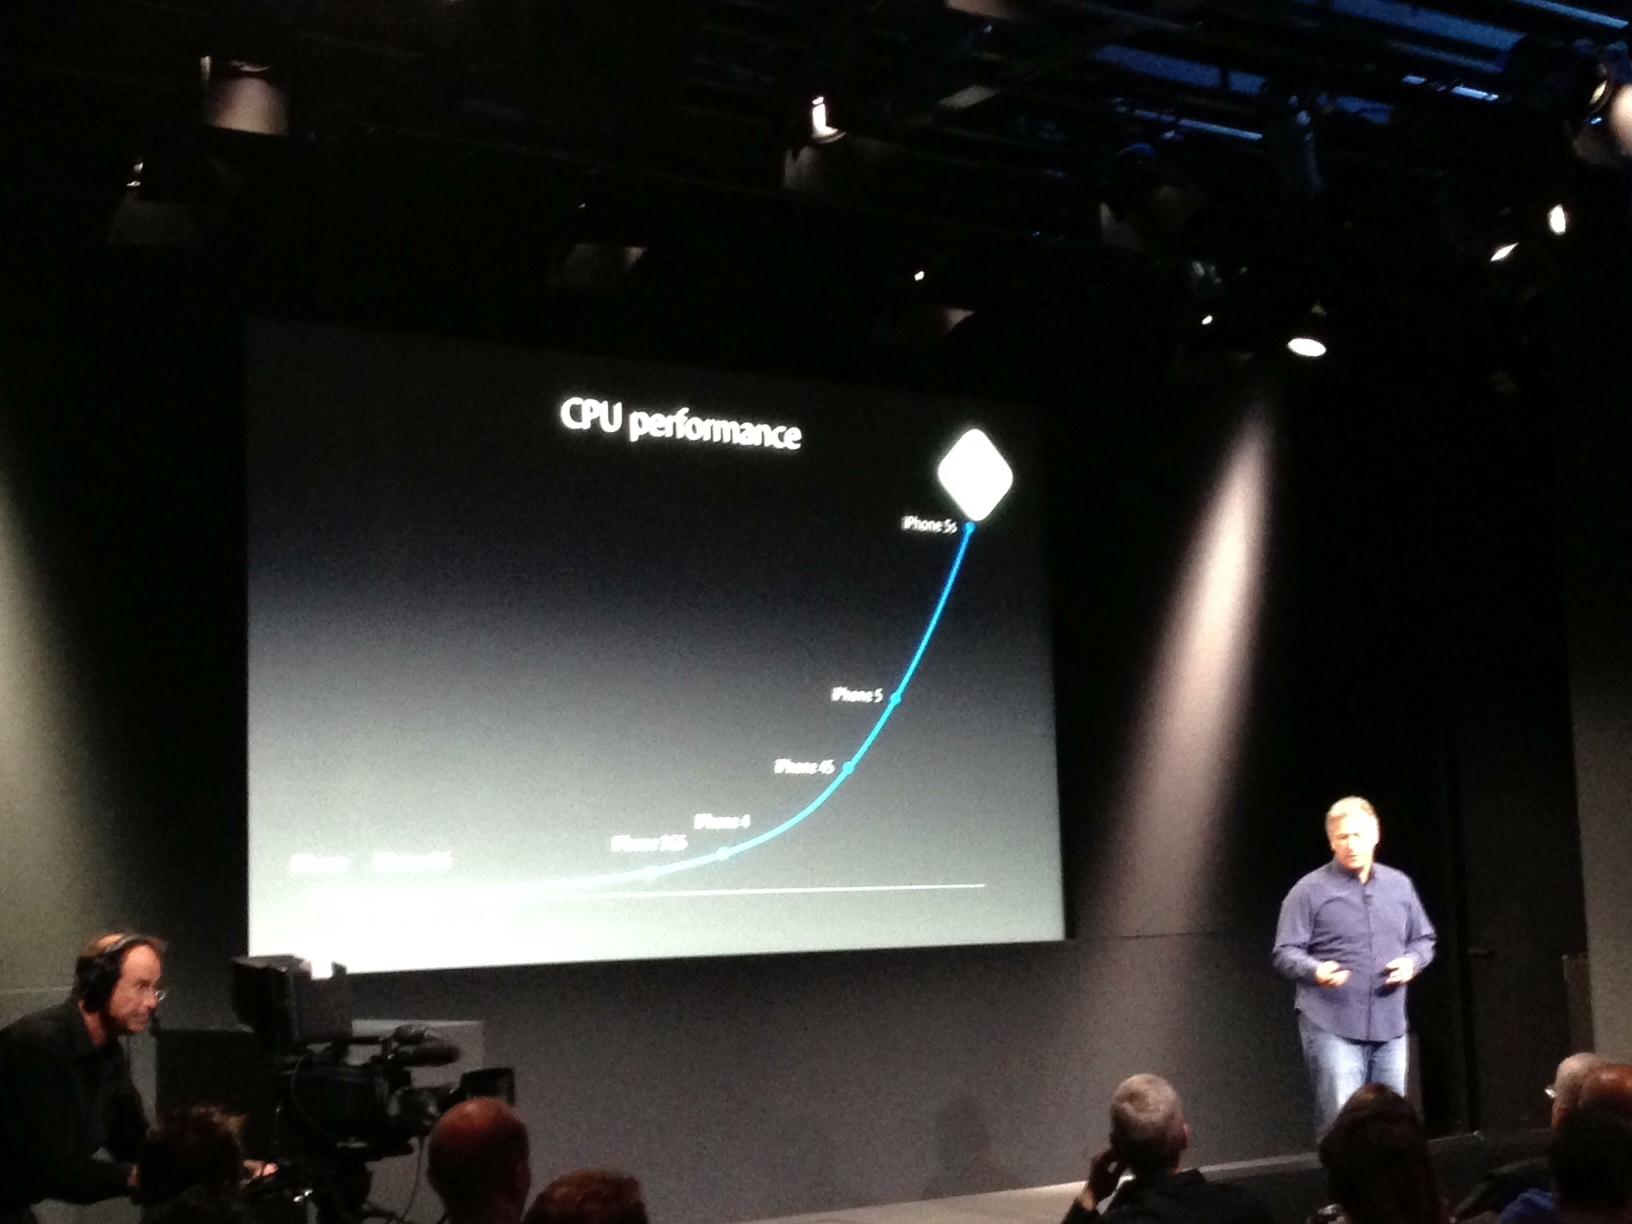 iPhone 5 event Phil Schiller CPU Performance